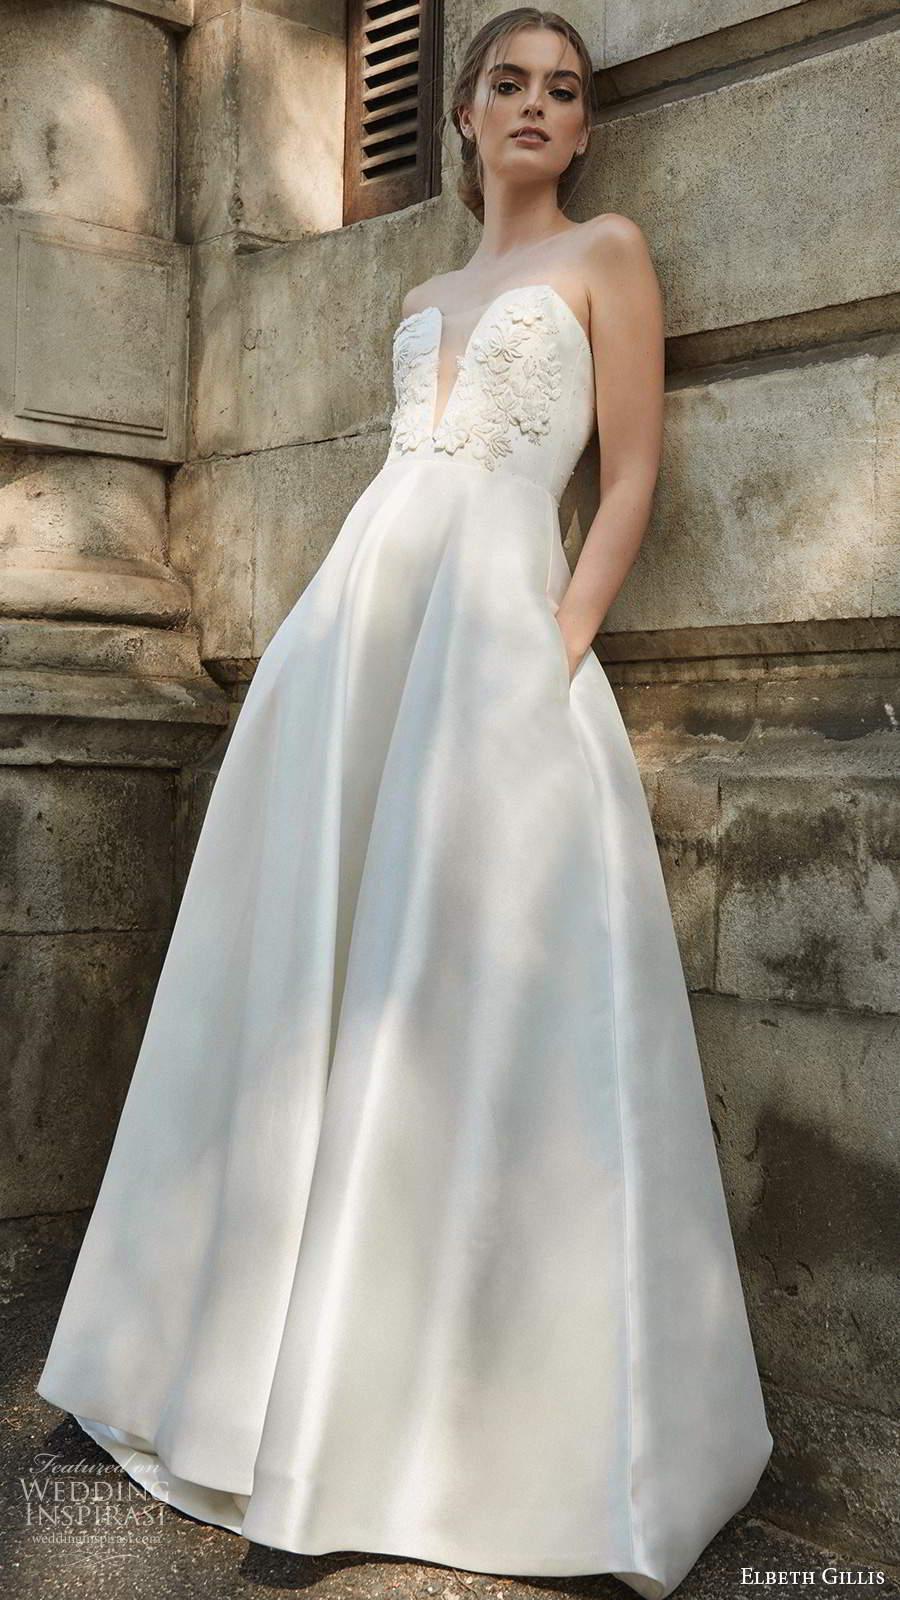 elbeth gillis 2021 bridal strapless plunging sweetheart neckline embellished bodice a line ball gown wedding dress chapel train (13) mv